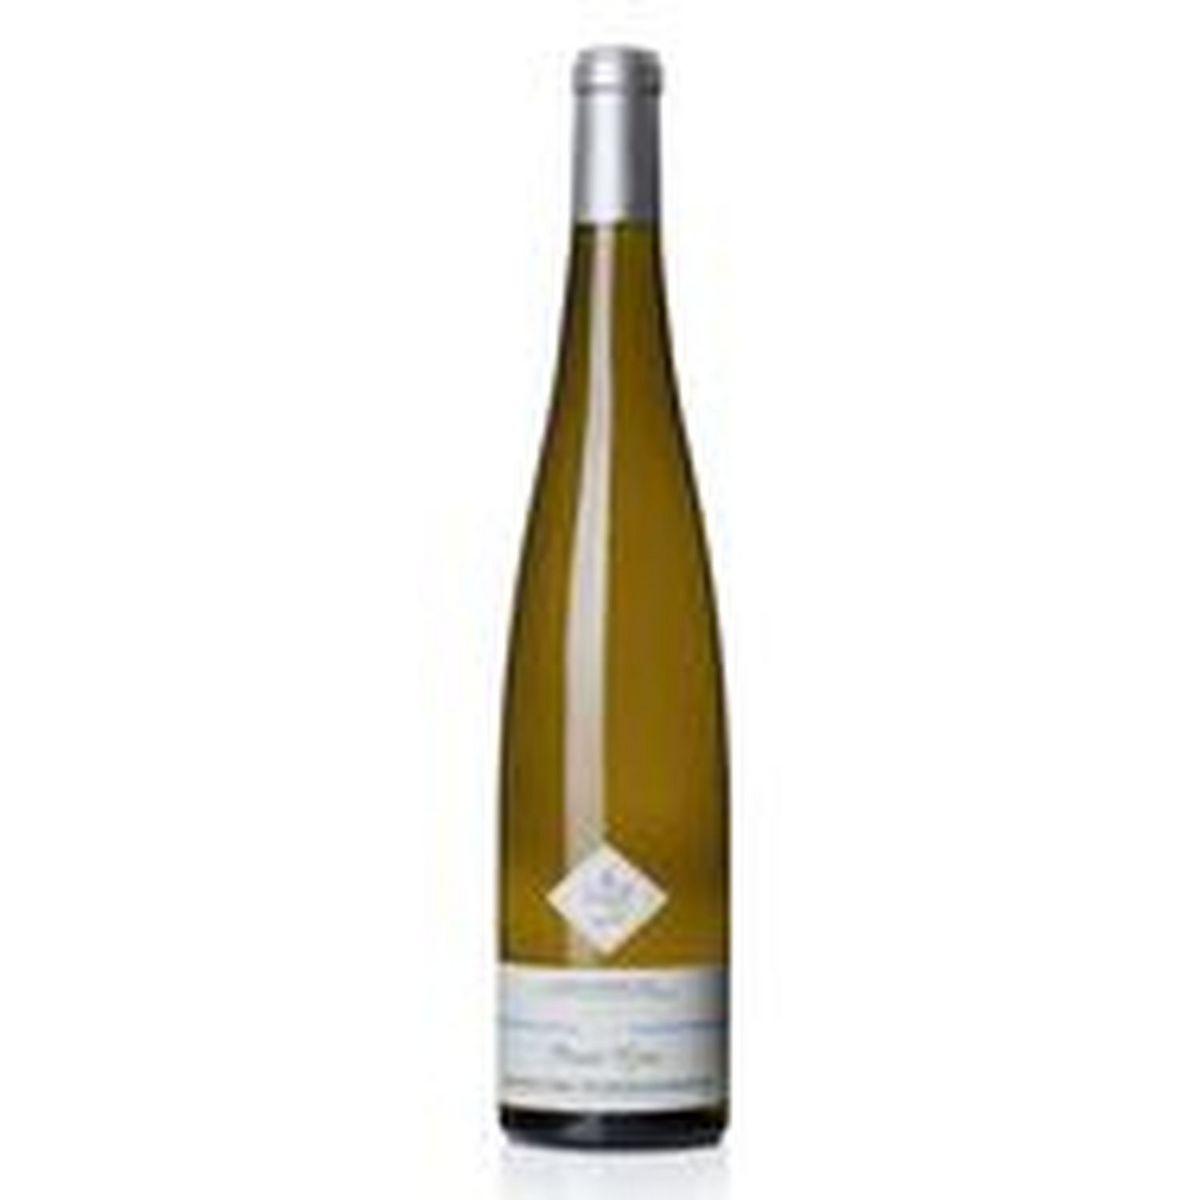 AOP Alsace Pinot Gris Grand Cru Schoenenbourg Domaine Dopff 2014 blanc